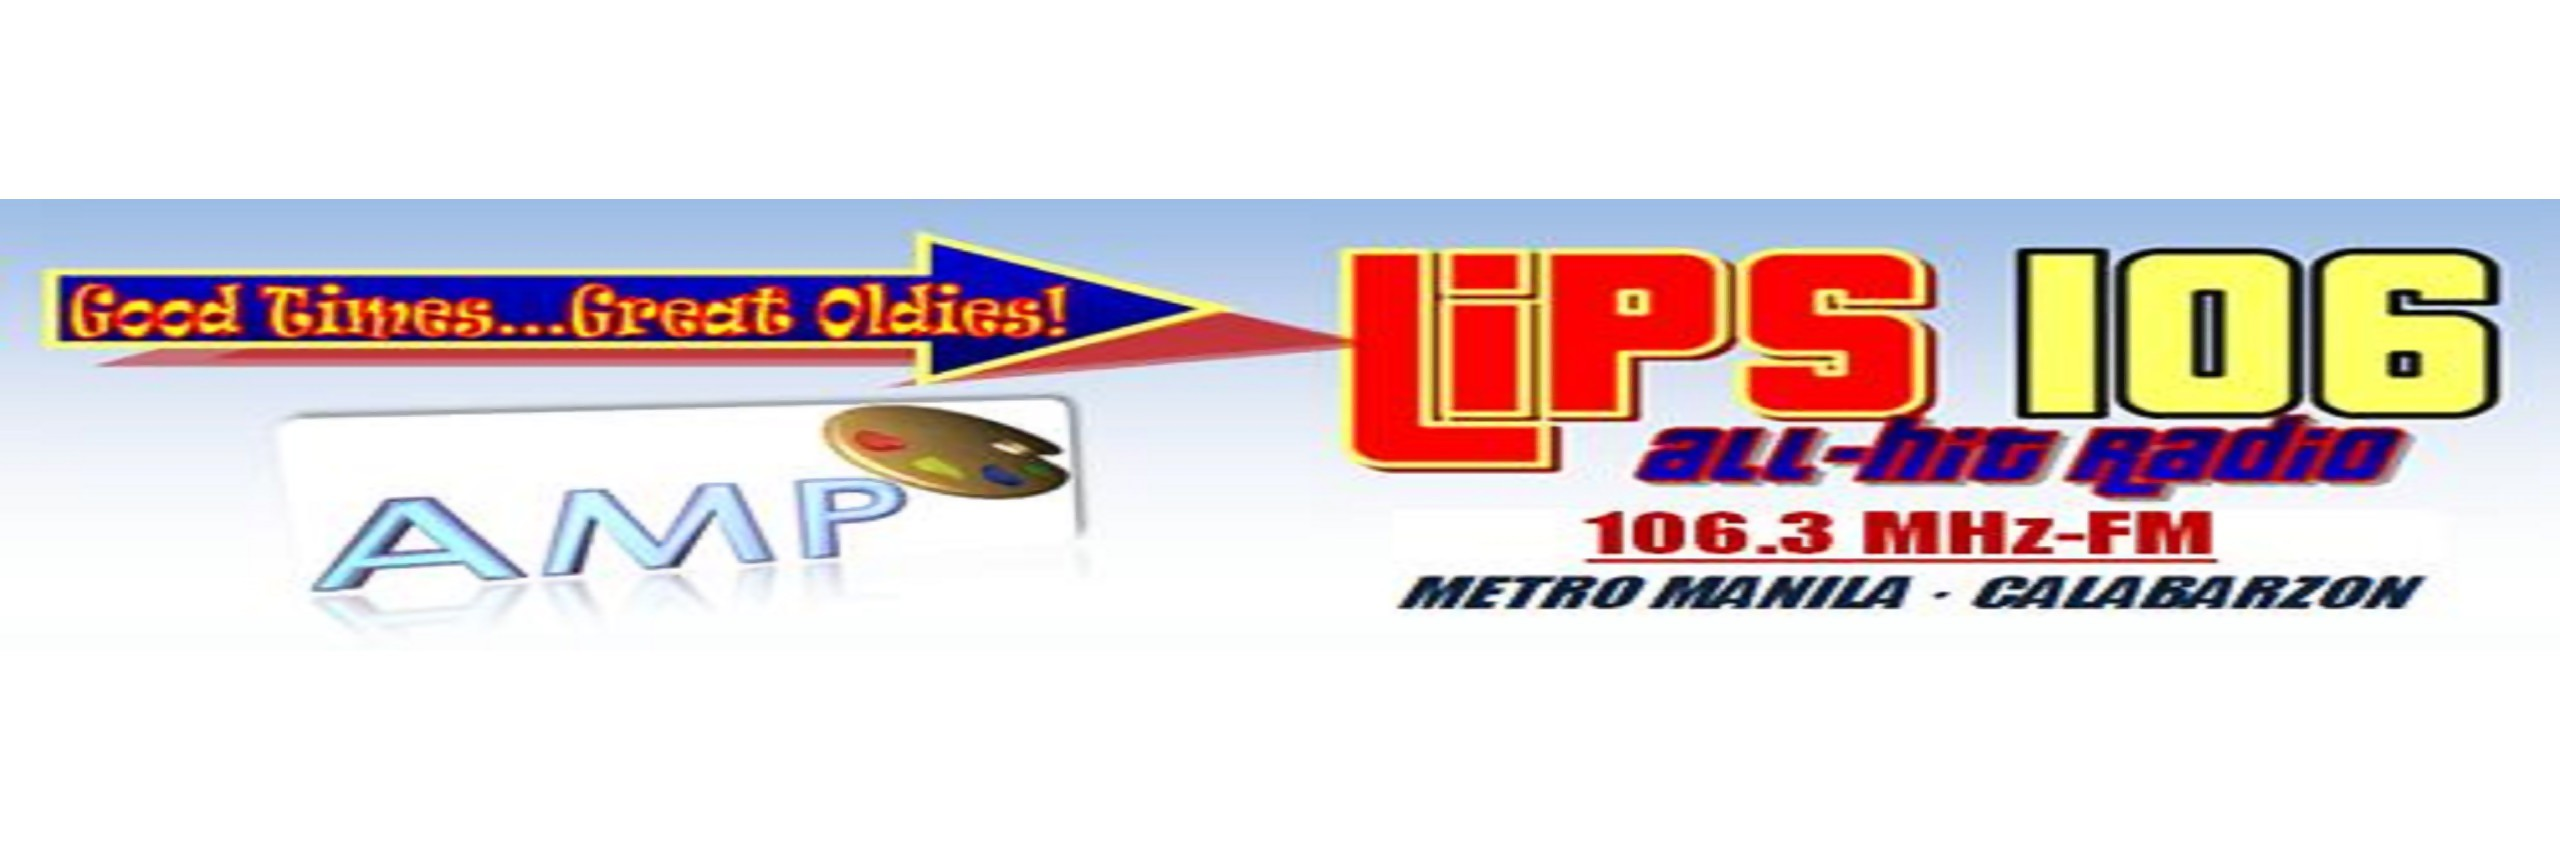 Lips106 DWYG Southern Tagalog